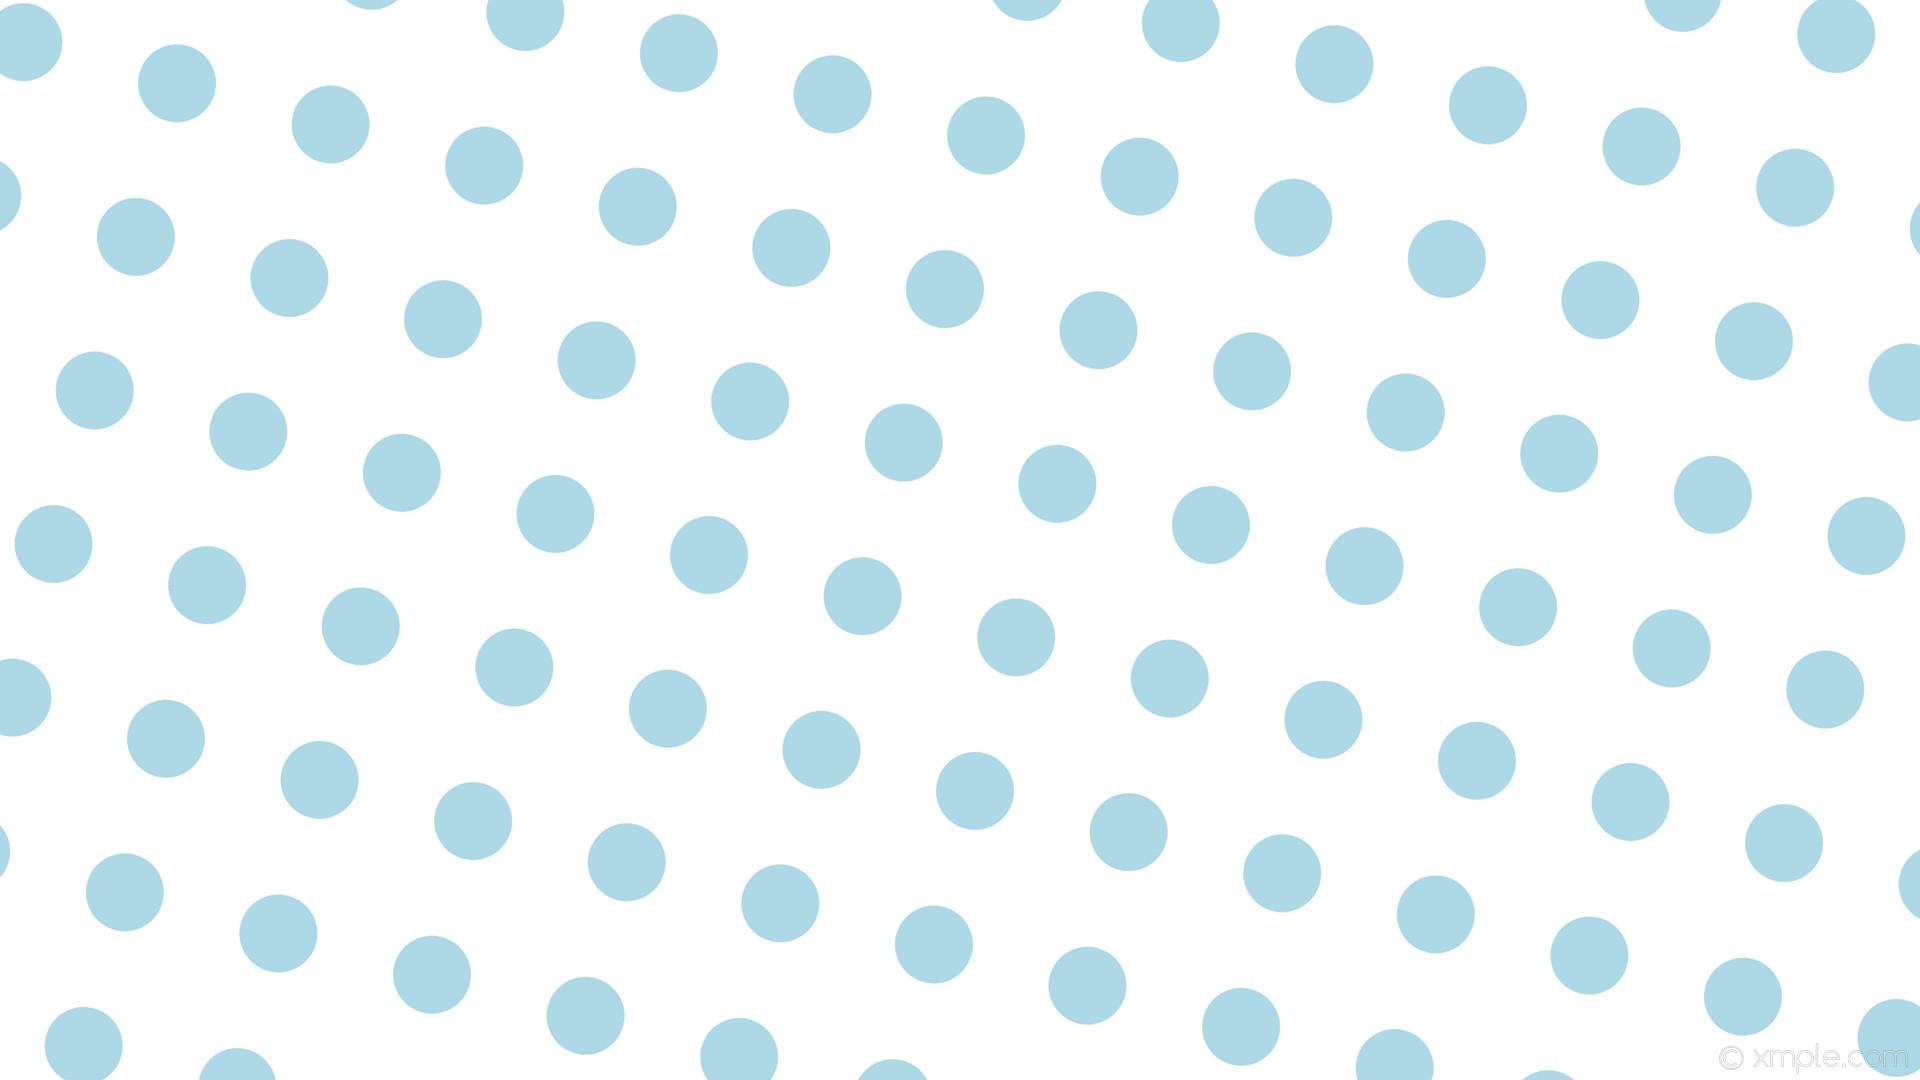 wallpaper white polka dots spots blue light blue #ffffff #add8e6 75° 78px  159px